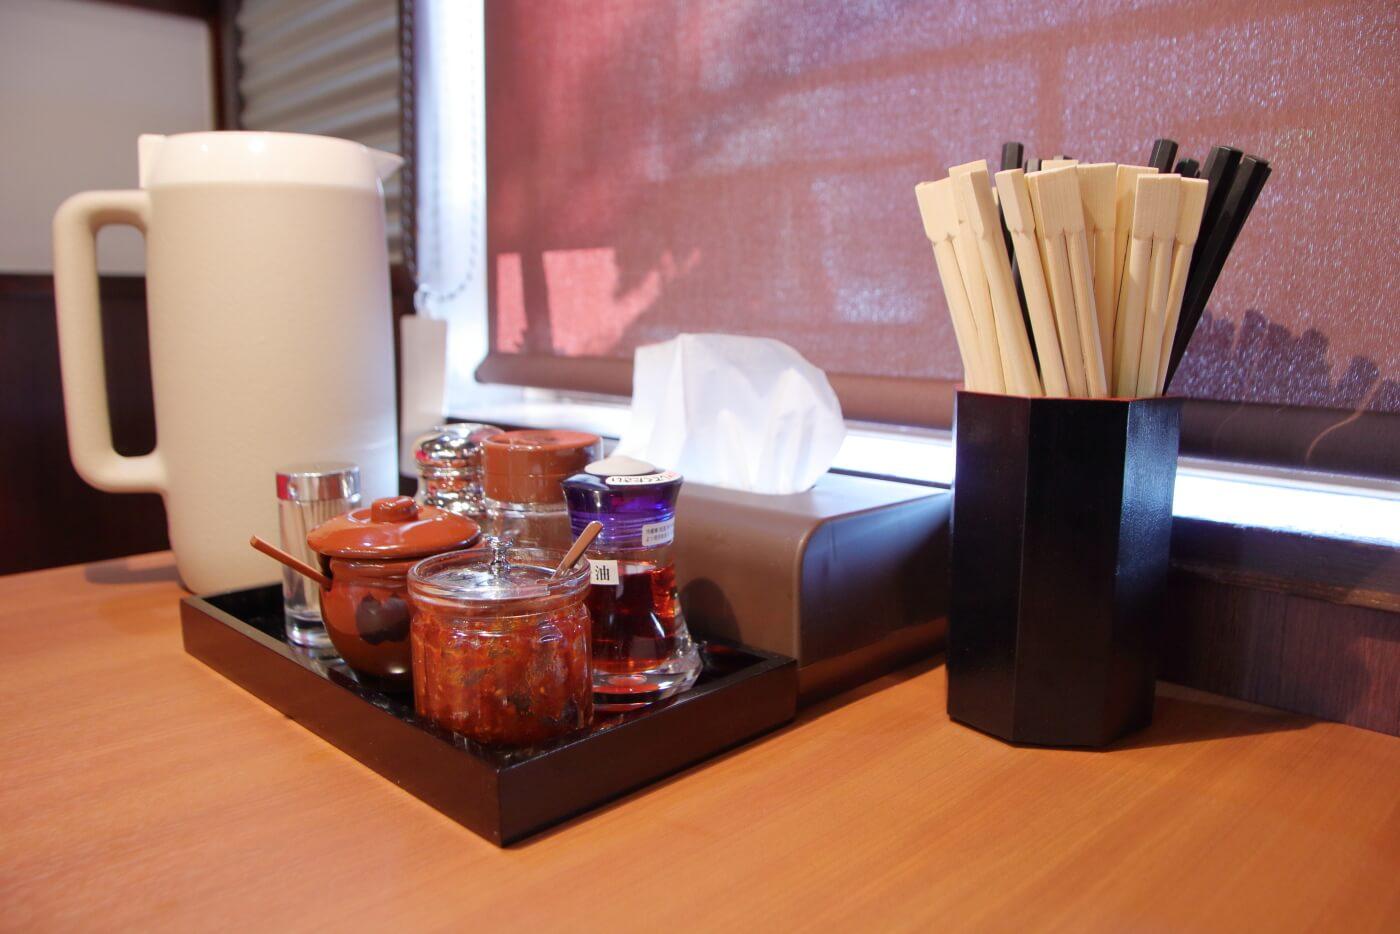 製麺処蔵木南国店の店内